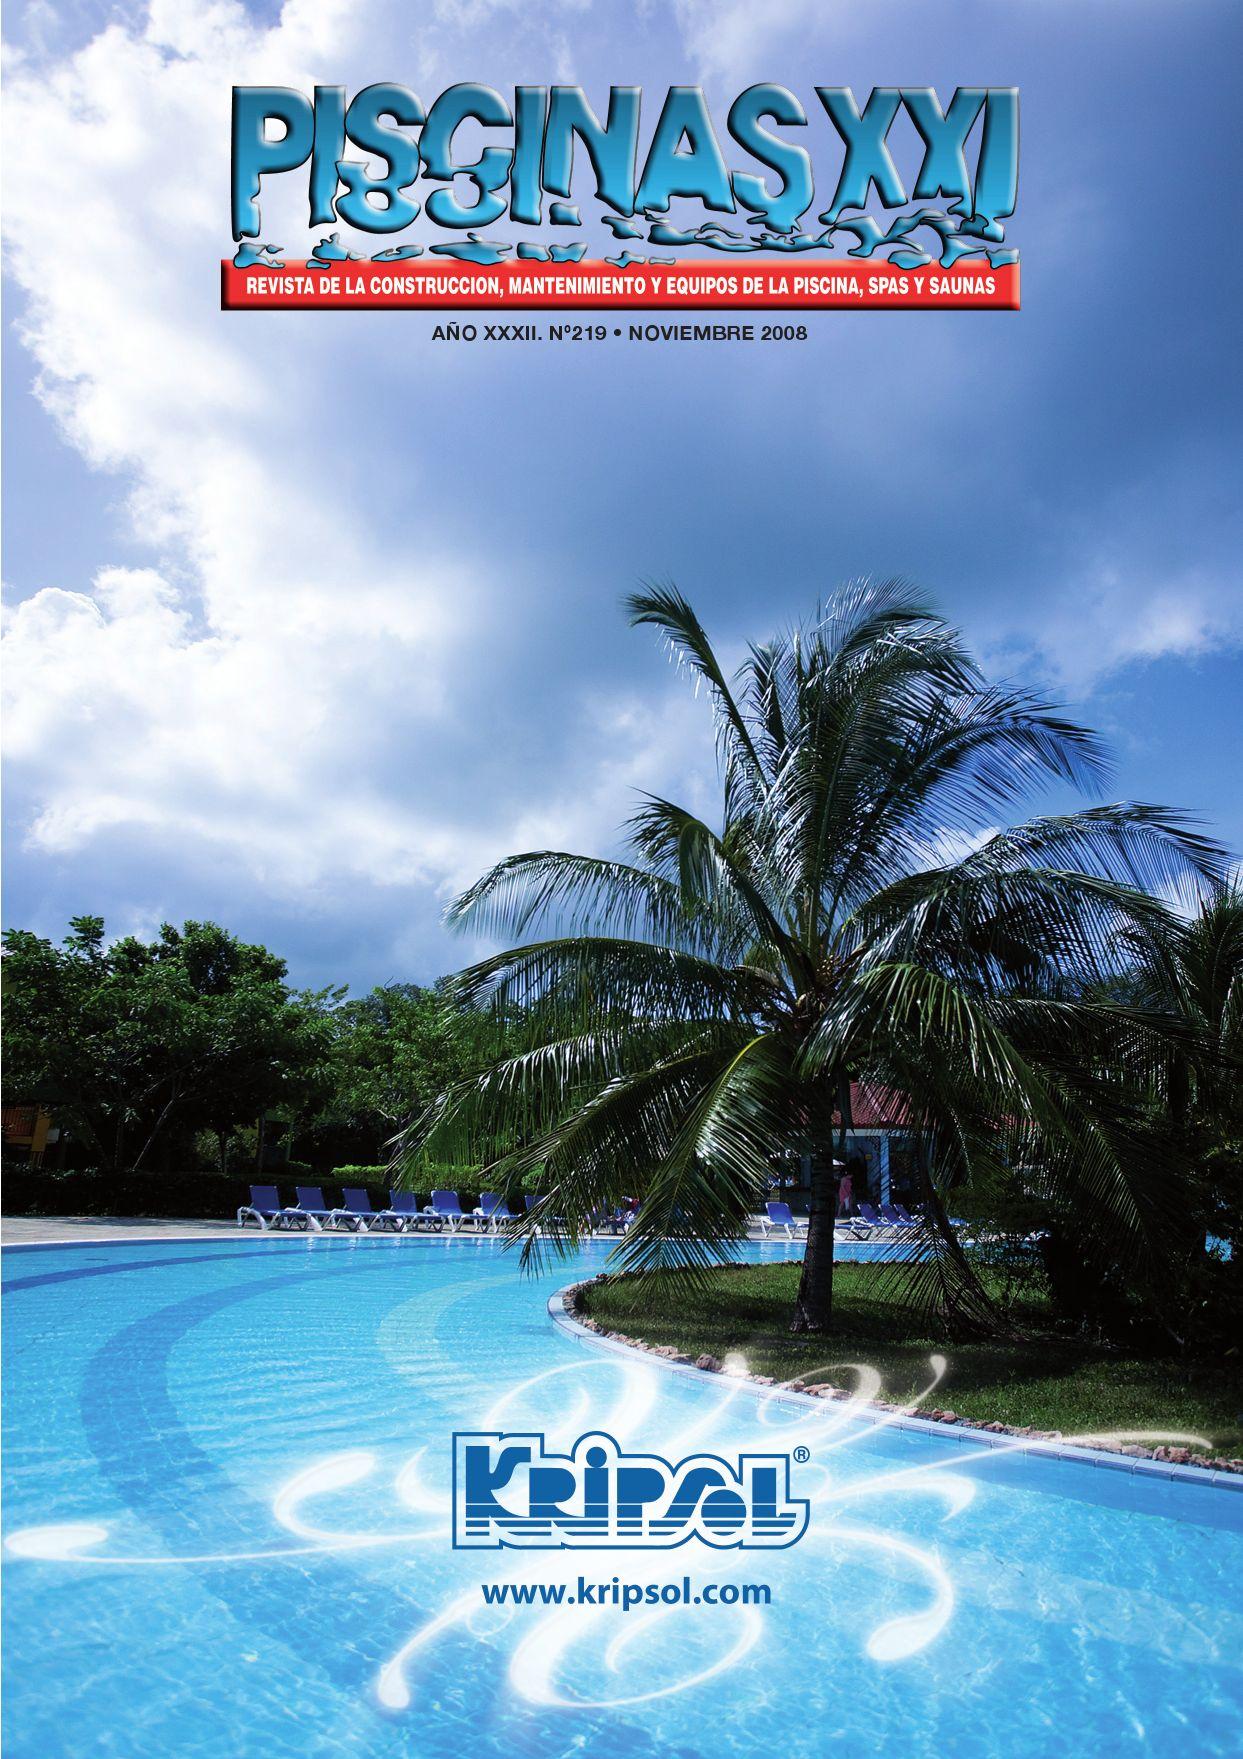 Piscinas xxi n 219 by rbi issuu for Construccion de piscinas en galicia